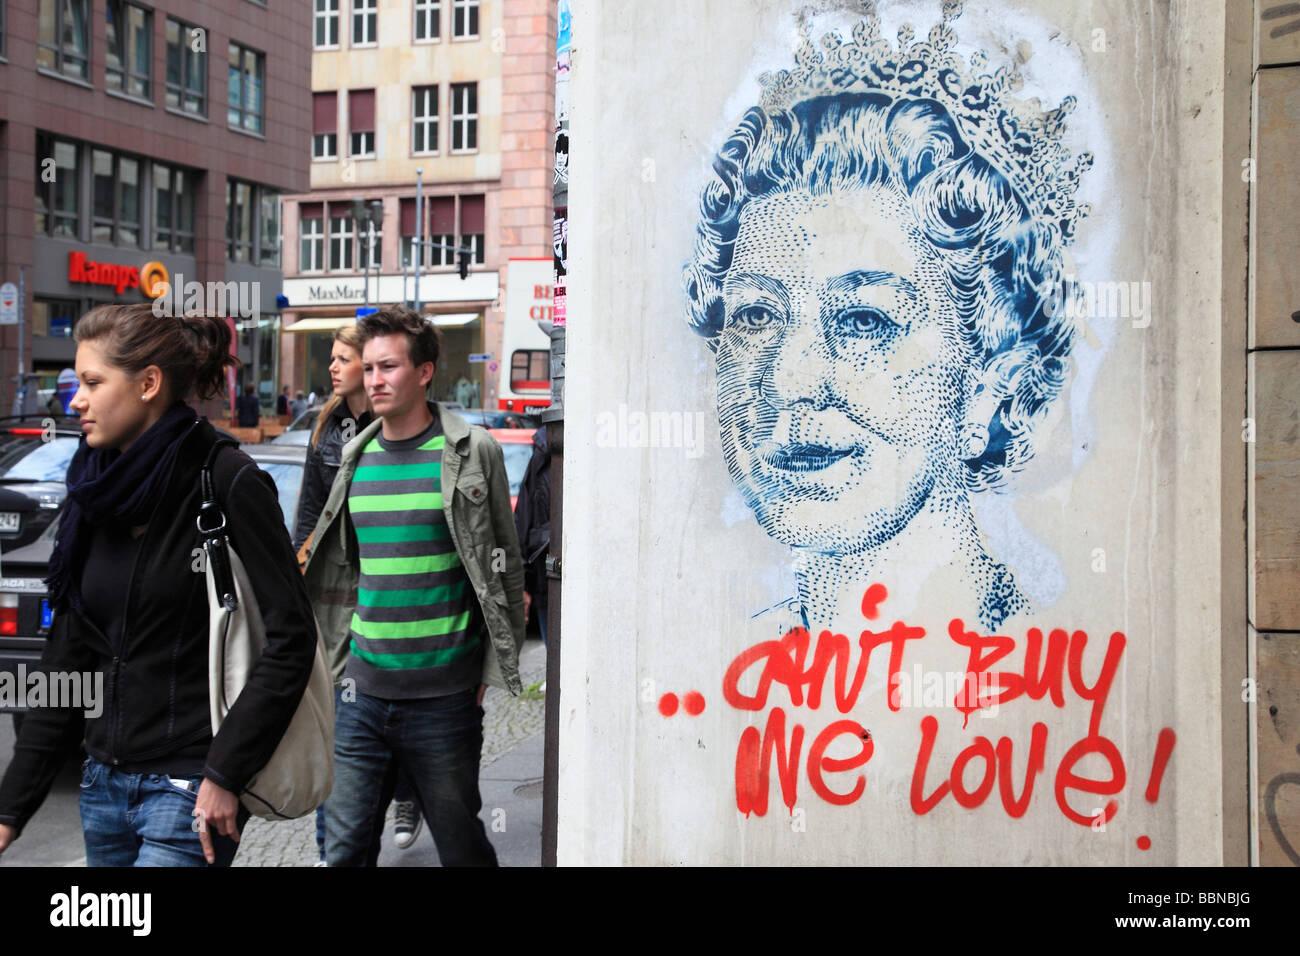 Queen Elizabeth I graffitti on the wall in Berlin Germany Europe - Stock Image